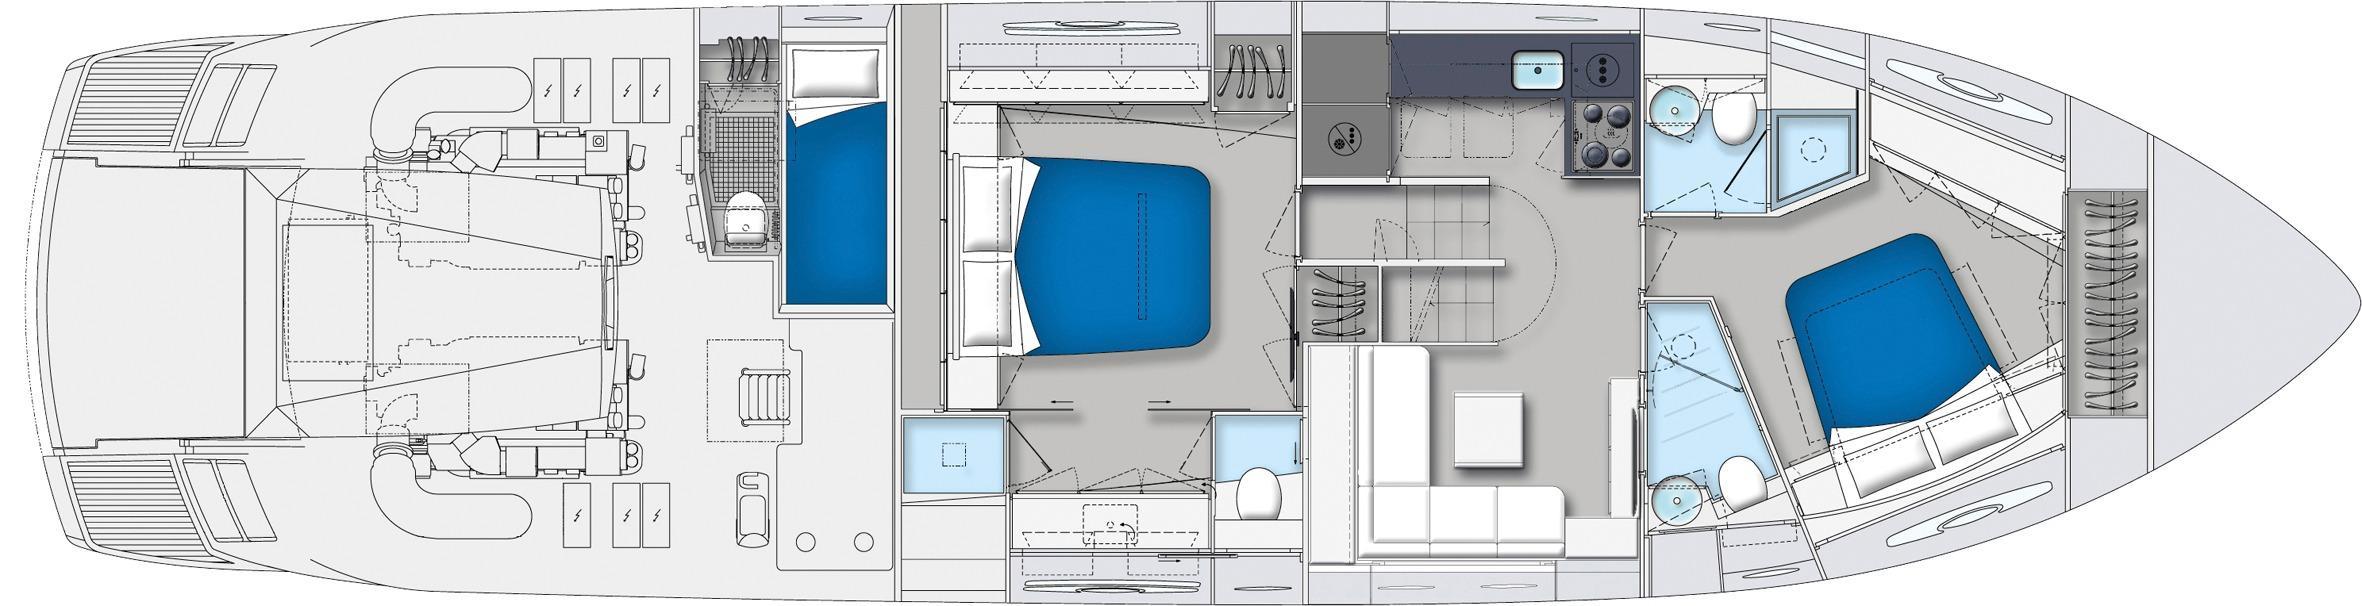 Manufacturer Provided Image: Pershing 62 3 Cabin Layout Plan